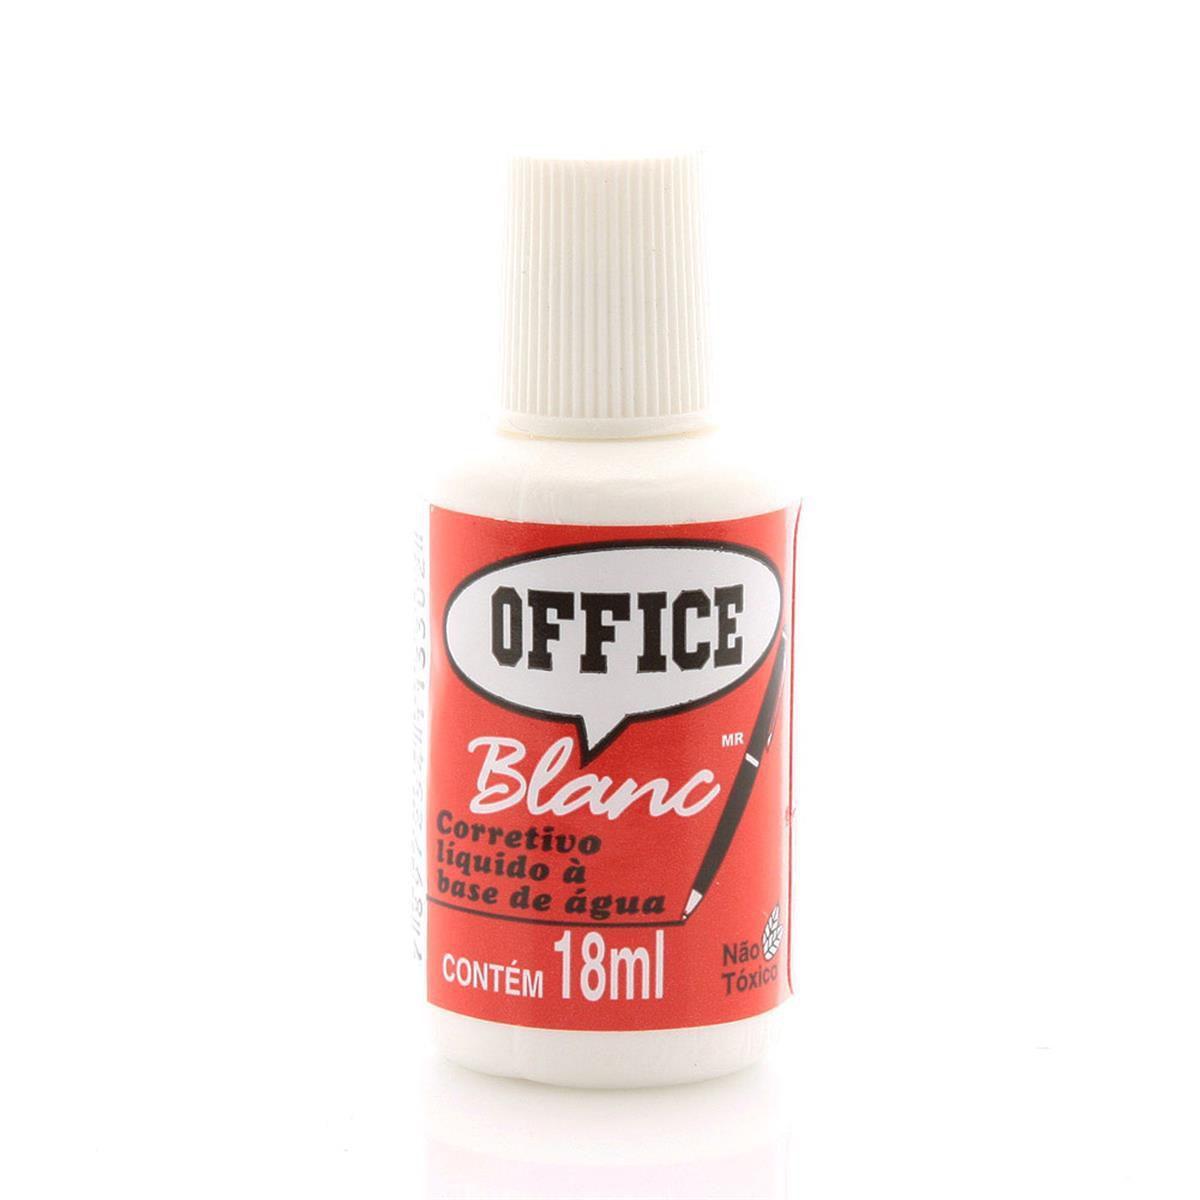 Corretivo 18ml Office Blanc Radex